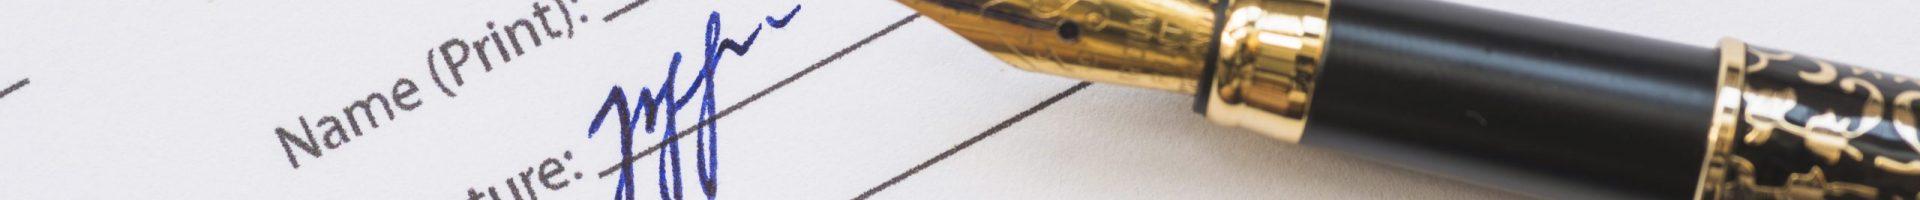 witness-signature-paper